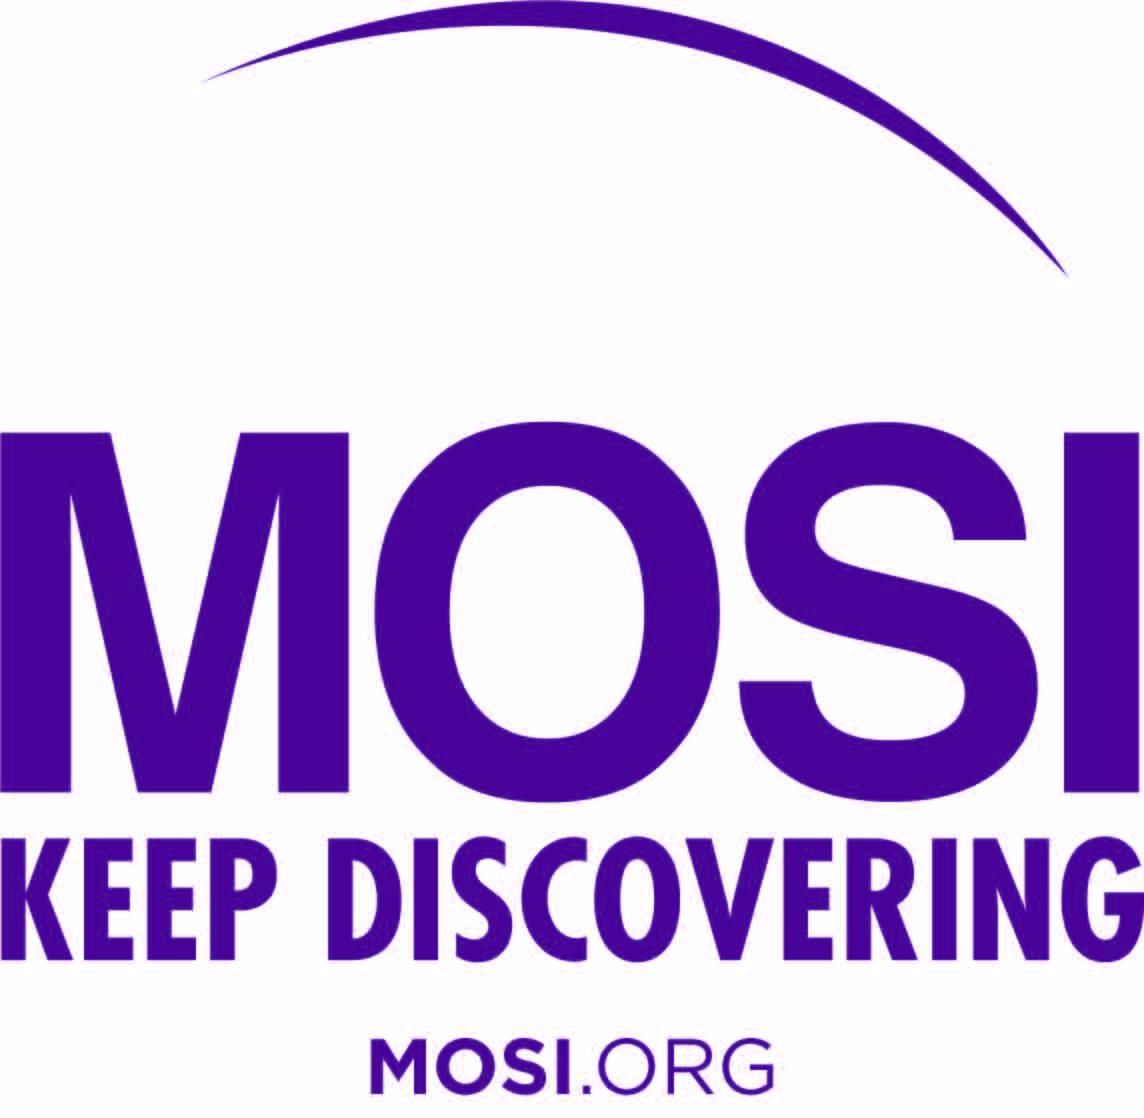 MOSI_Logo_Tag_Purple.jpg